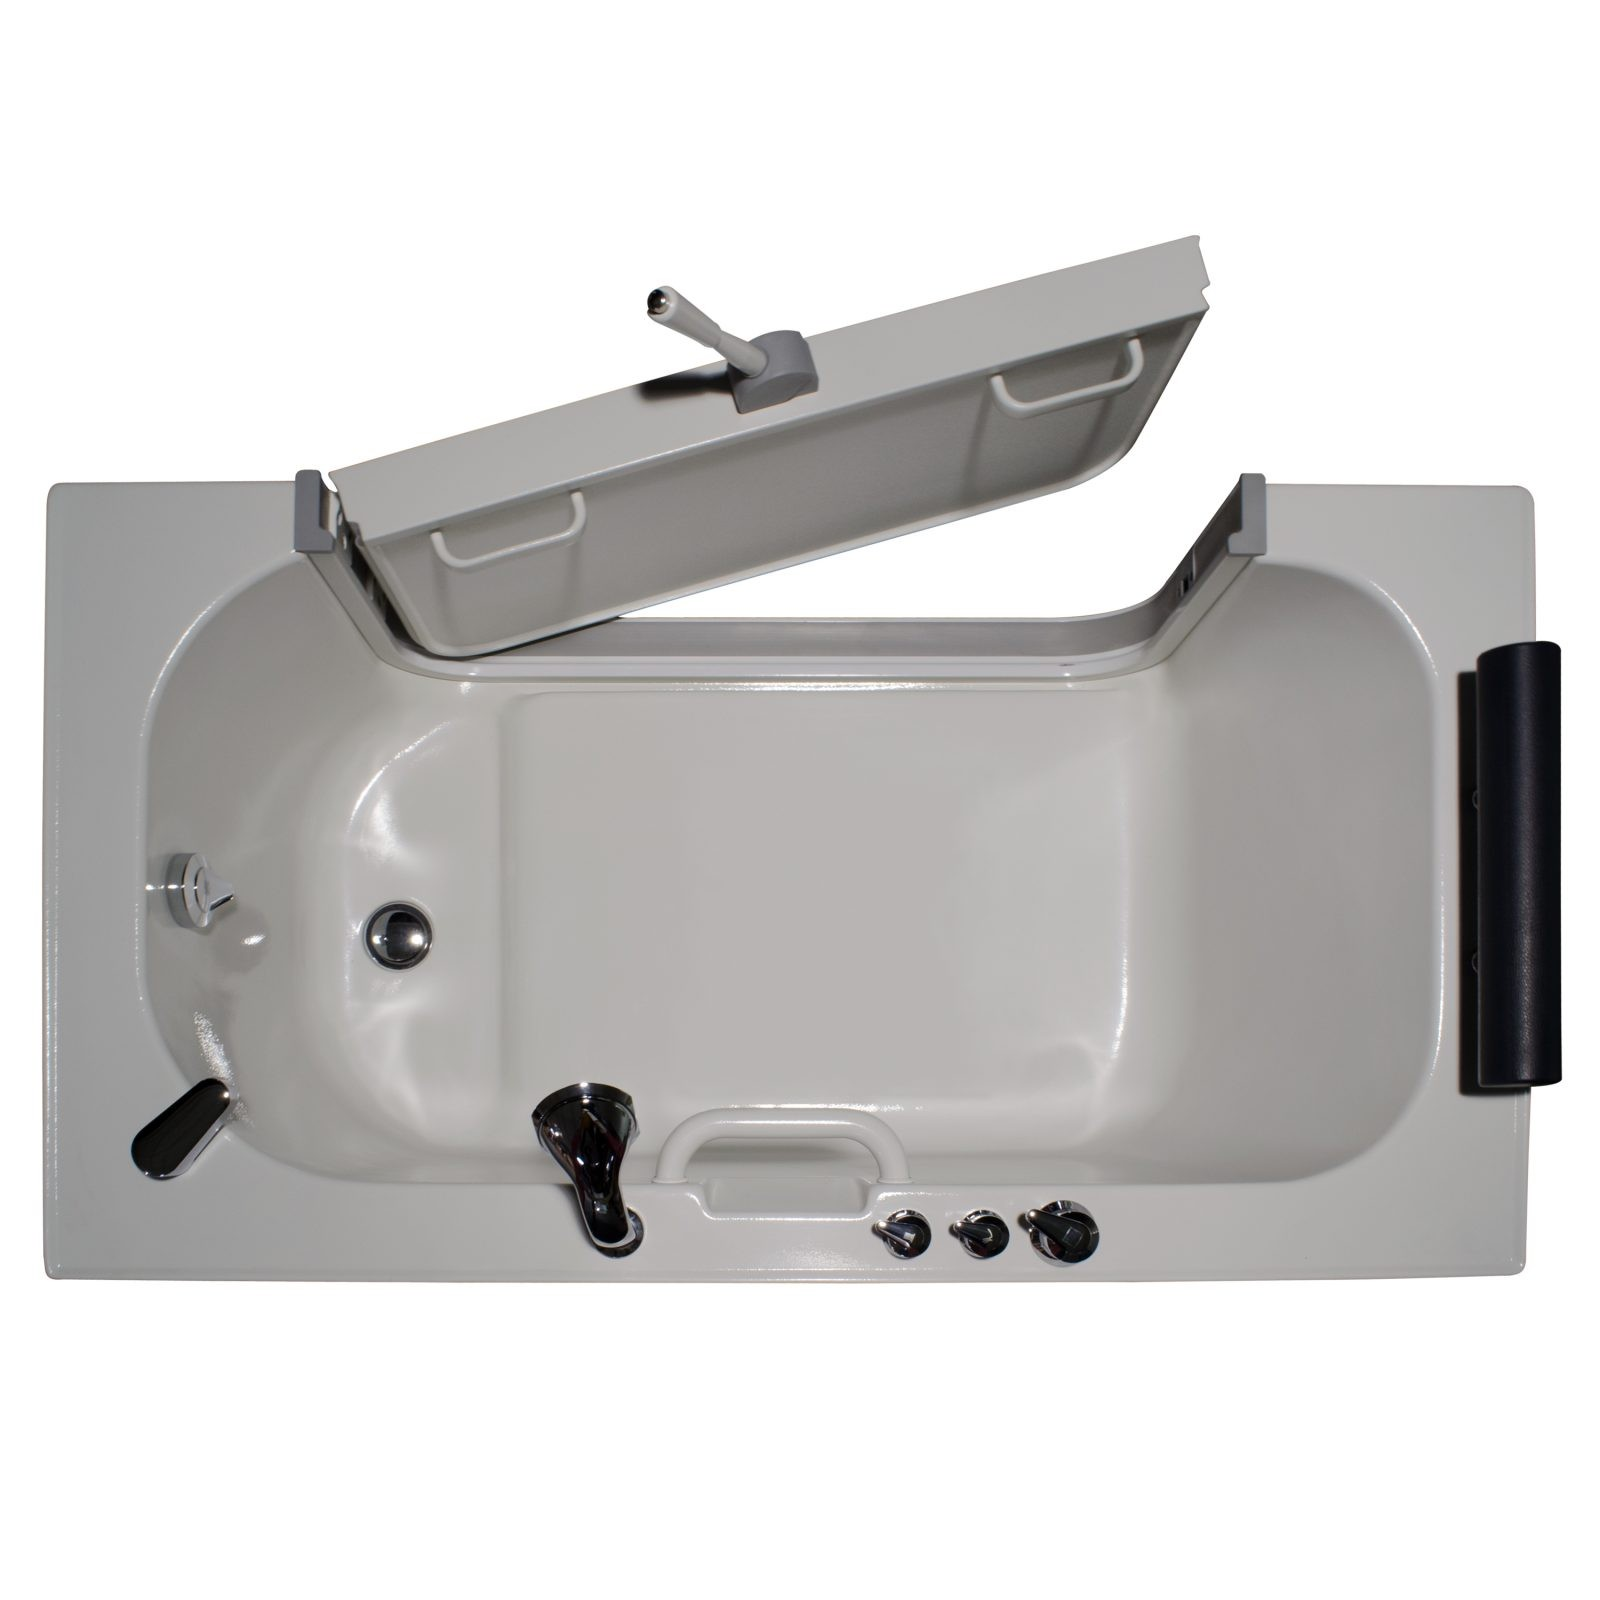 Neptune series sit in tubs buy now at homeward bath for Sit in tub shower